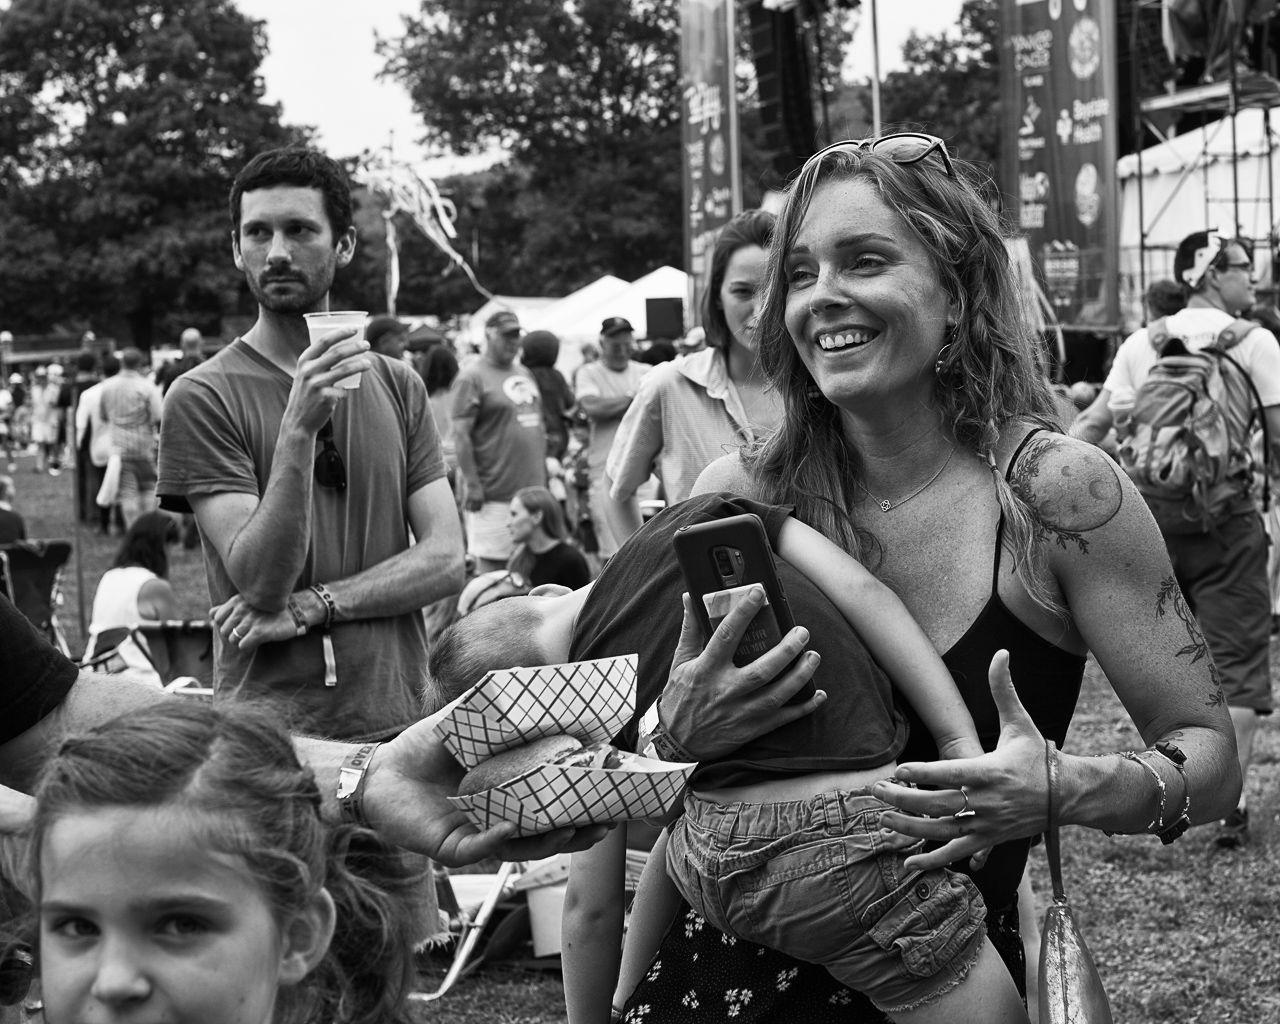 Festival - WEB - BW20180714--6.jpg